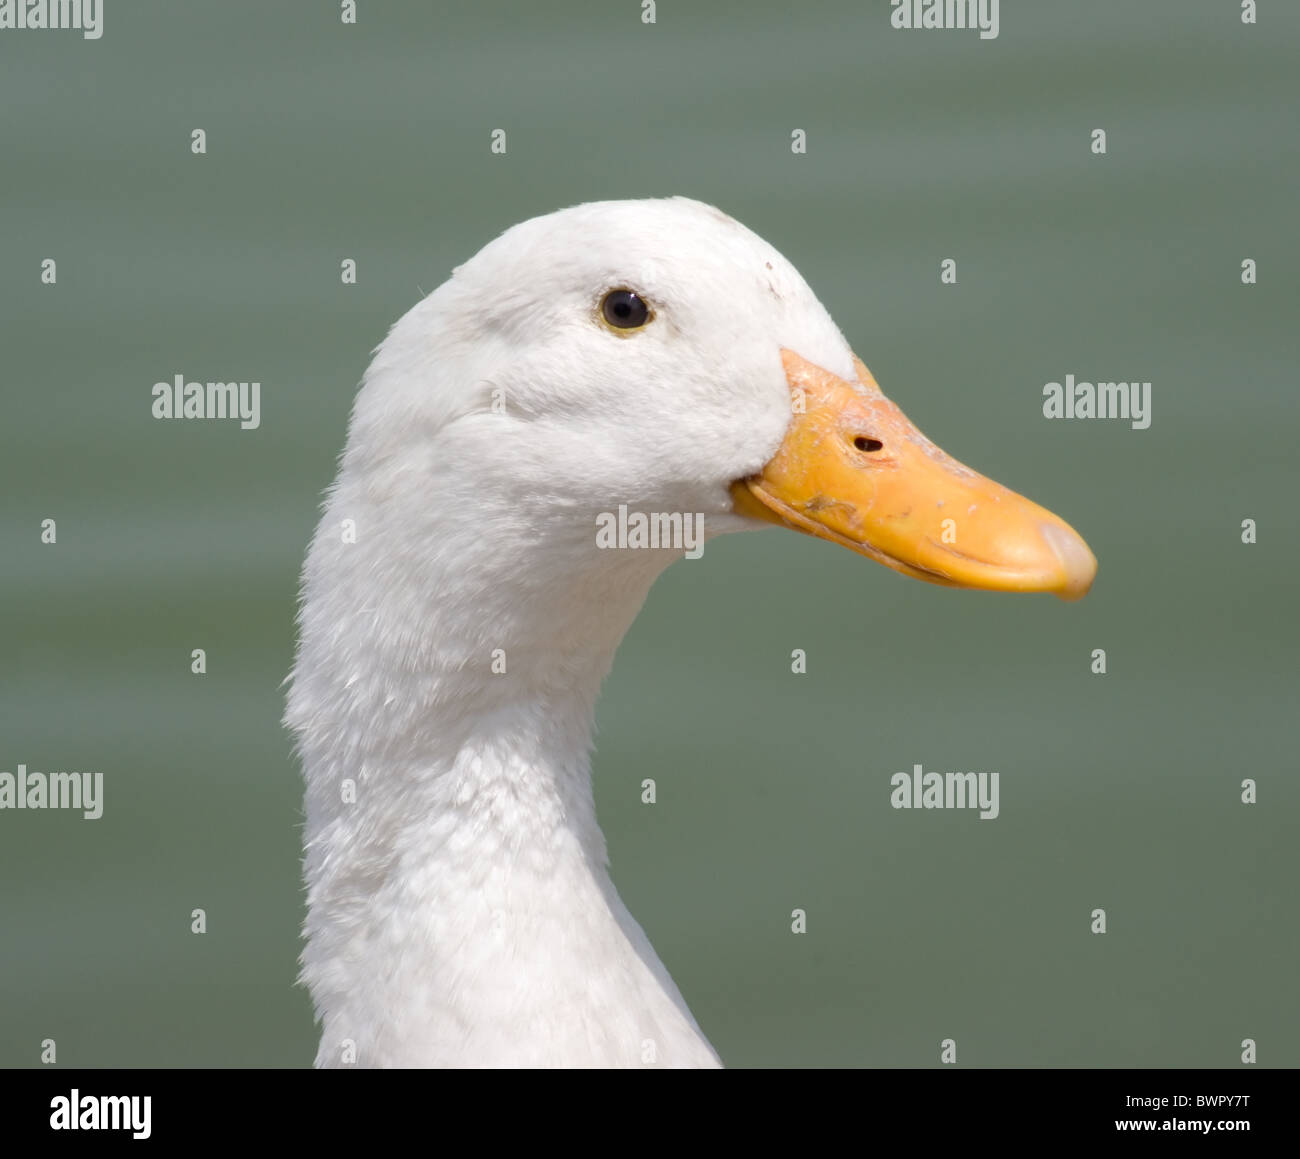 Head shot of a white duck near a lake - Stock Image